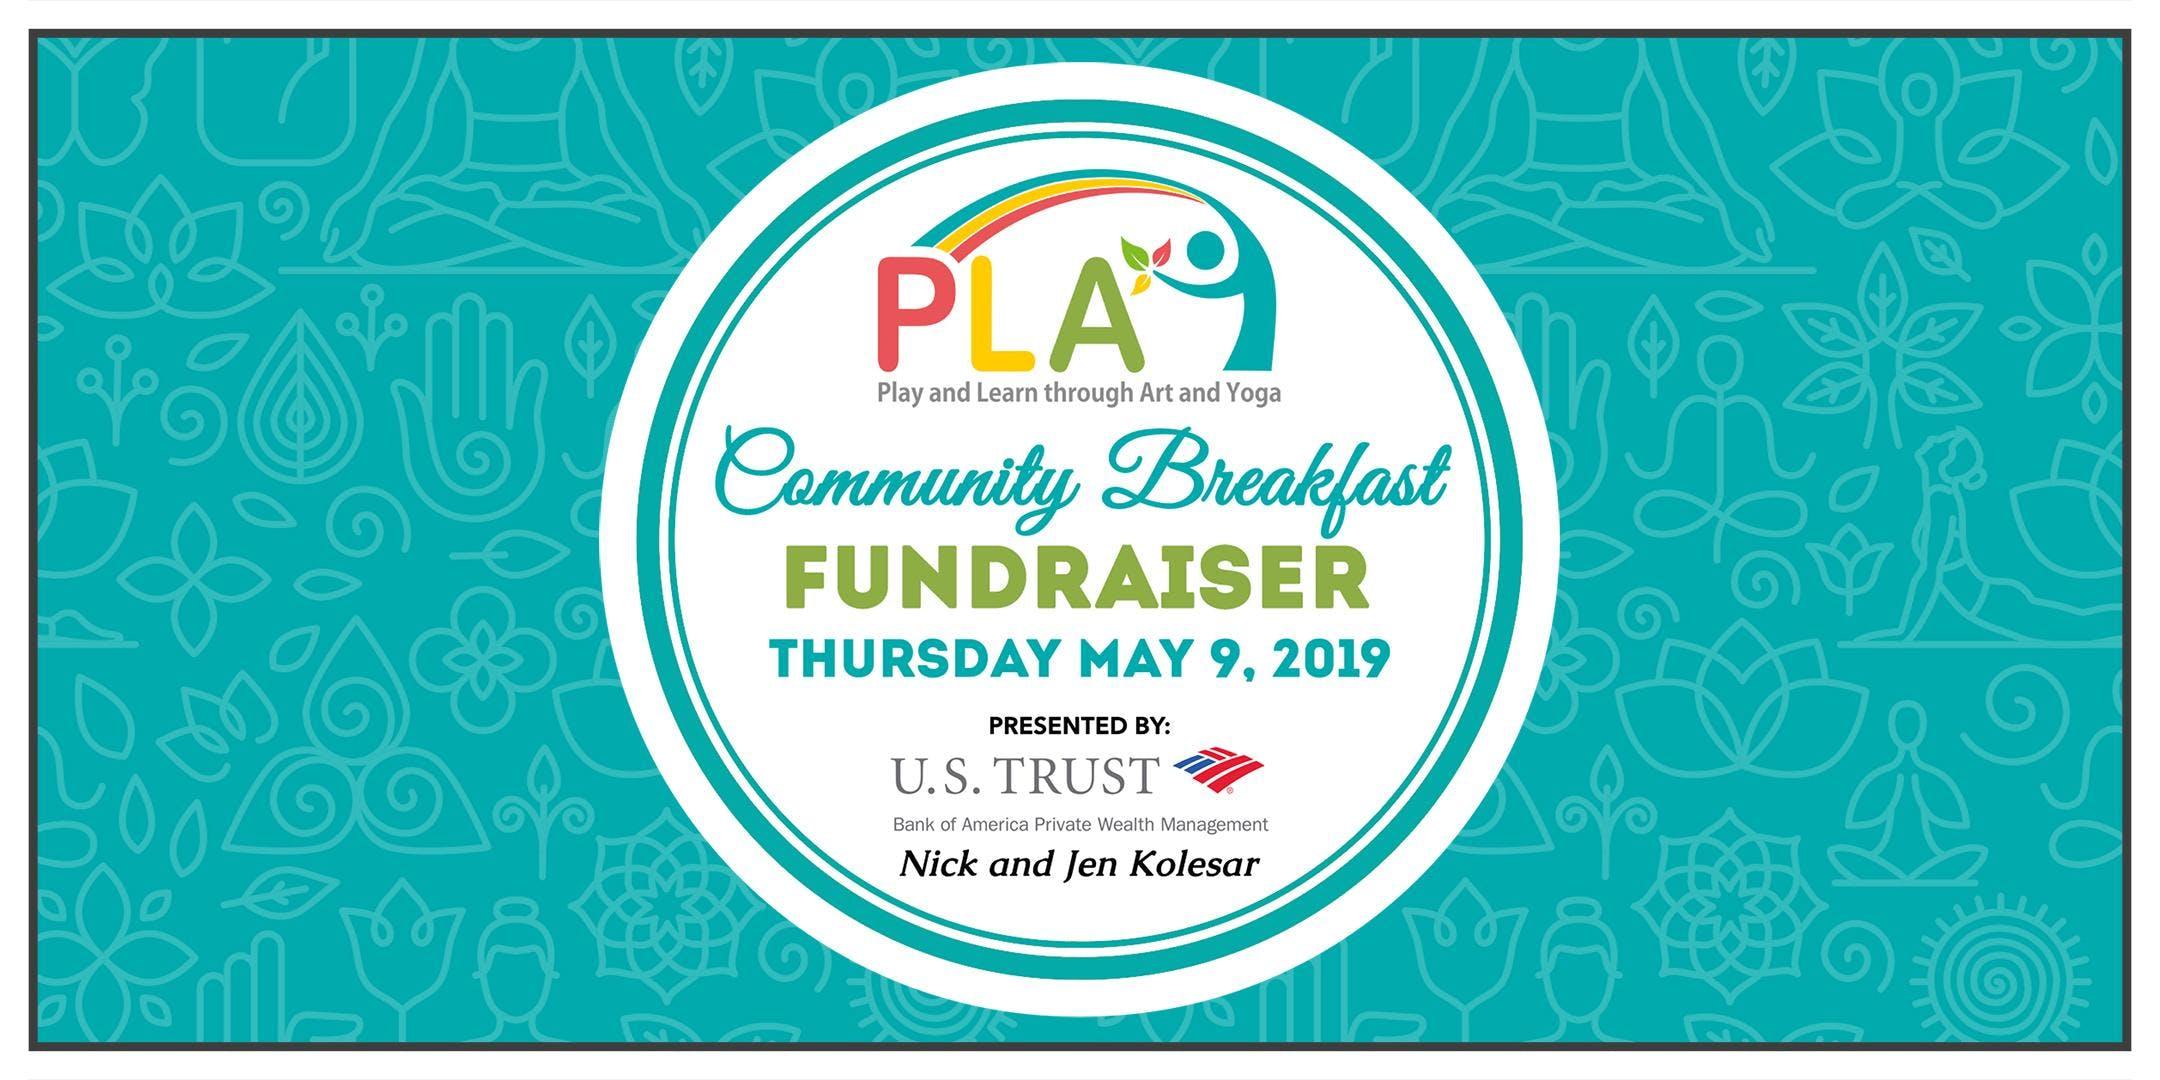 1st Annual PLAY Community Breakfast Fundraiser